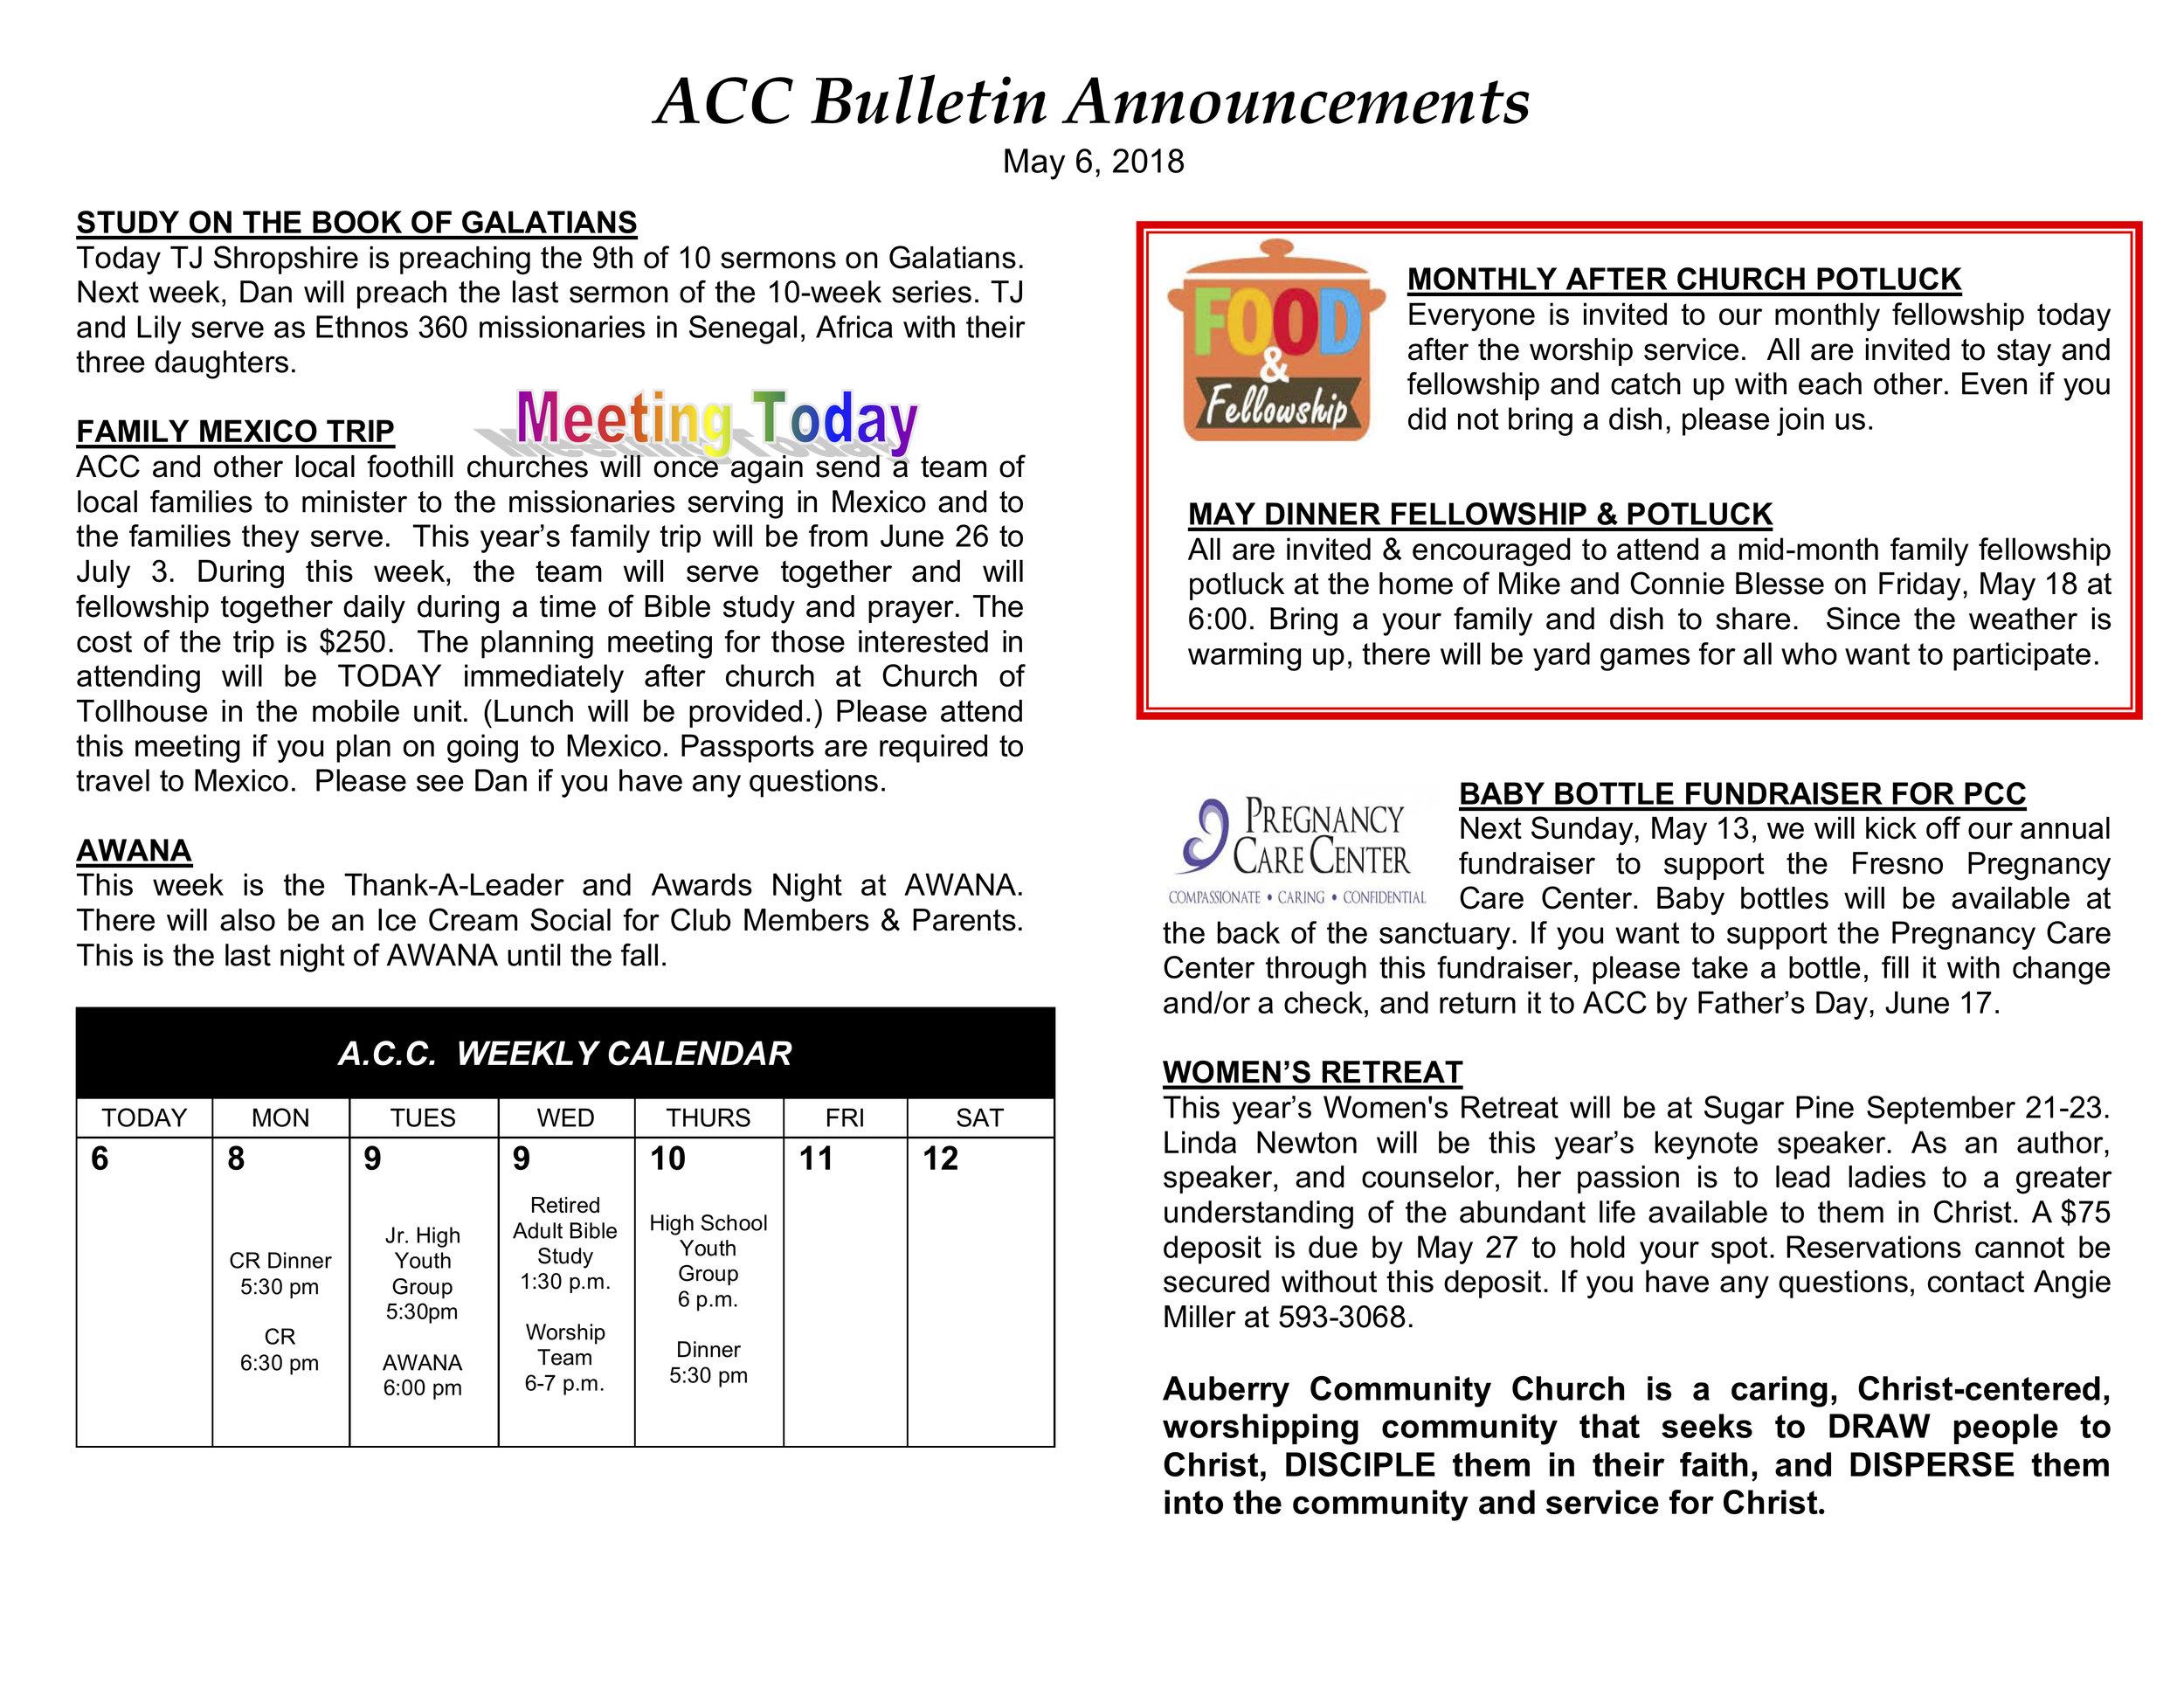 ACCBltn 2018.05.06-1.jpg